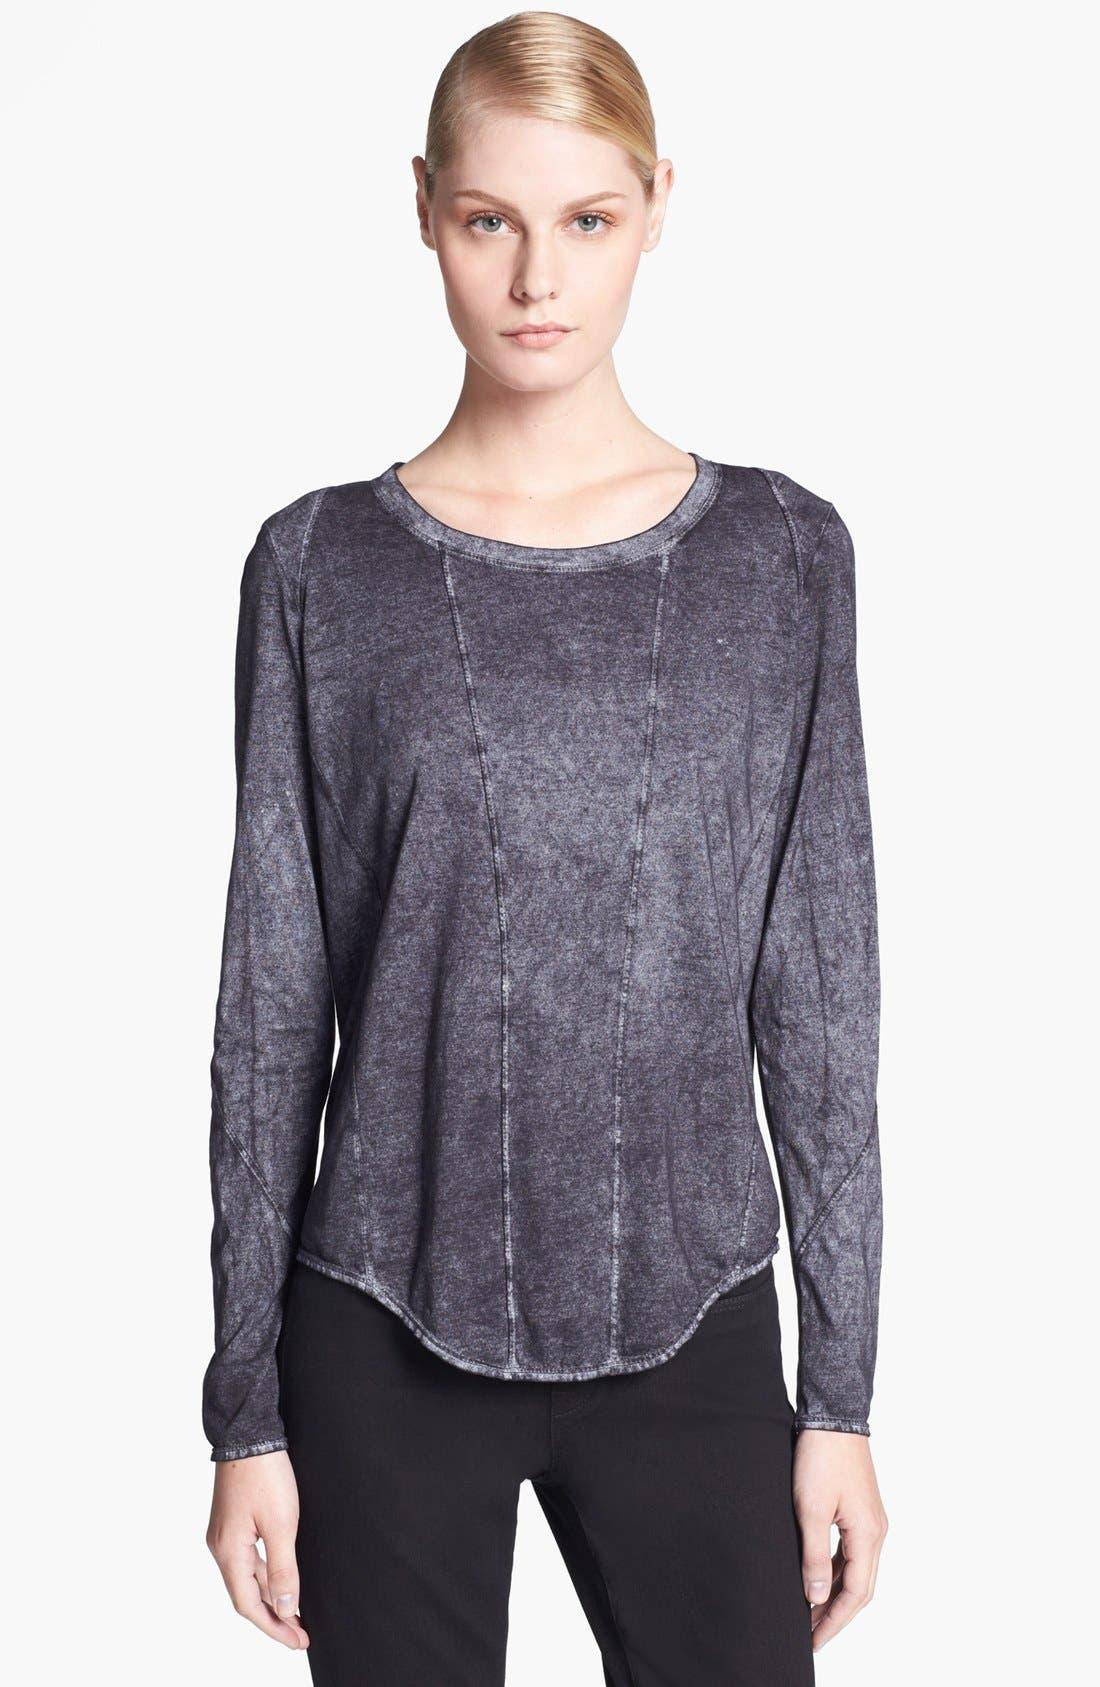 Main Image - HELMUT Helmut Lang 'Chalk' Long Sleeve Jersey Tee